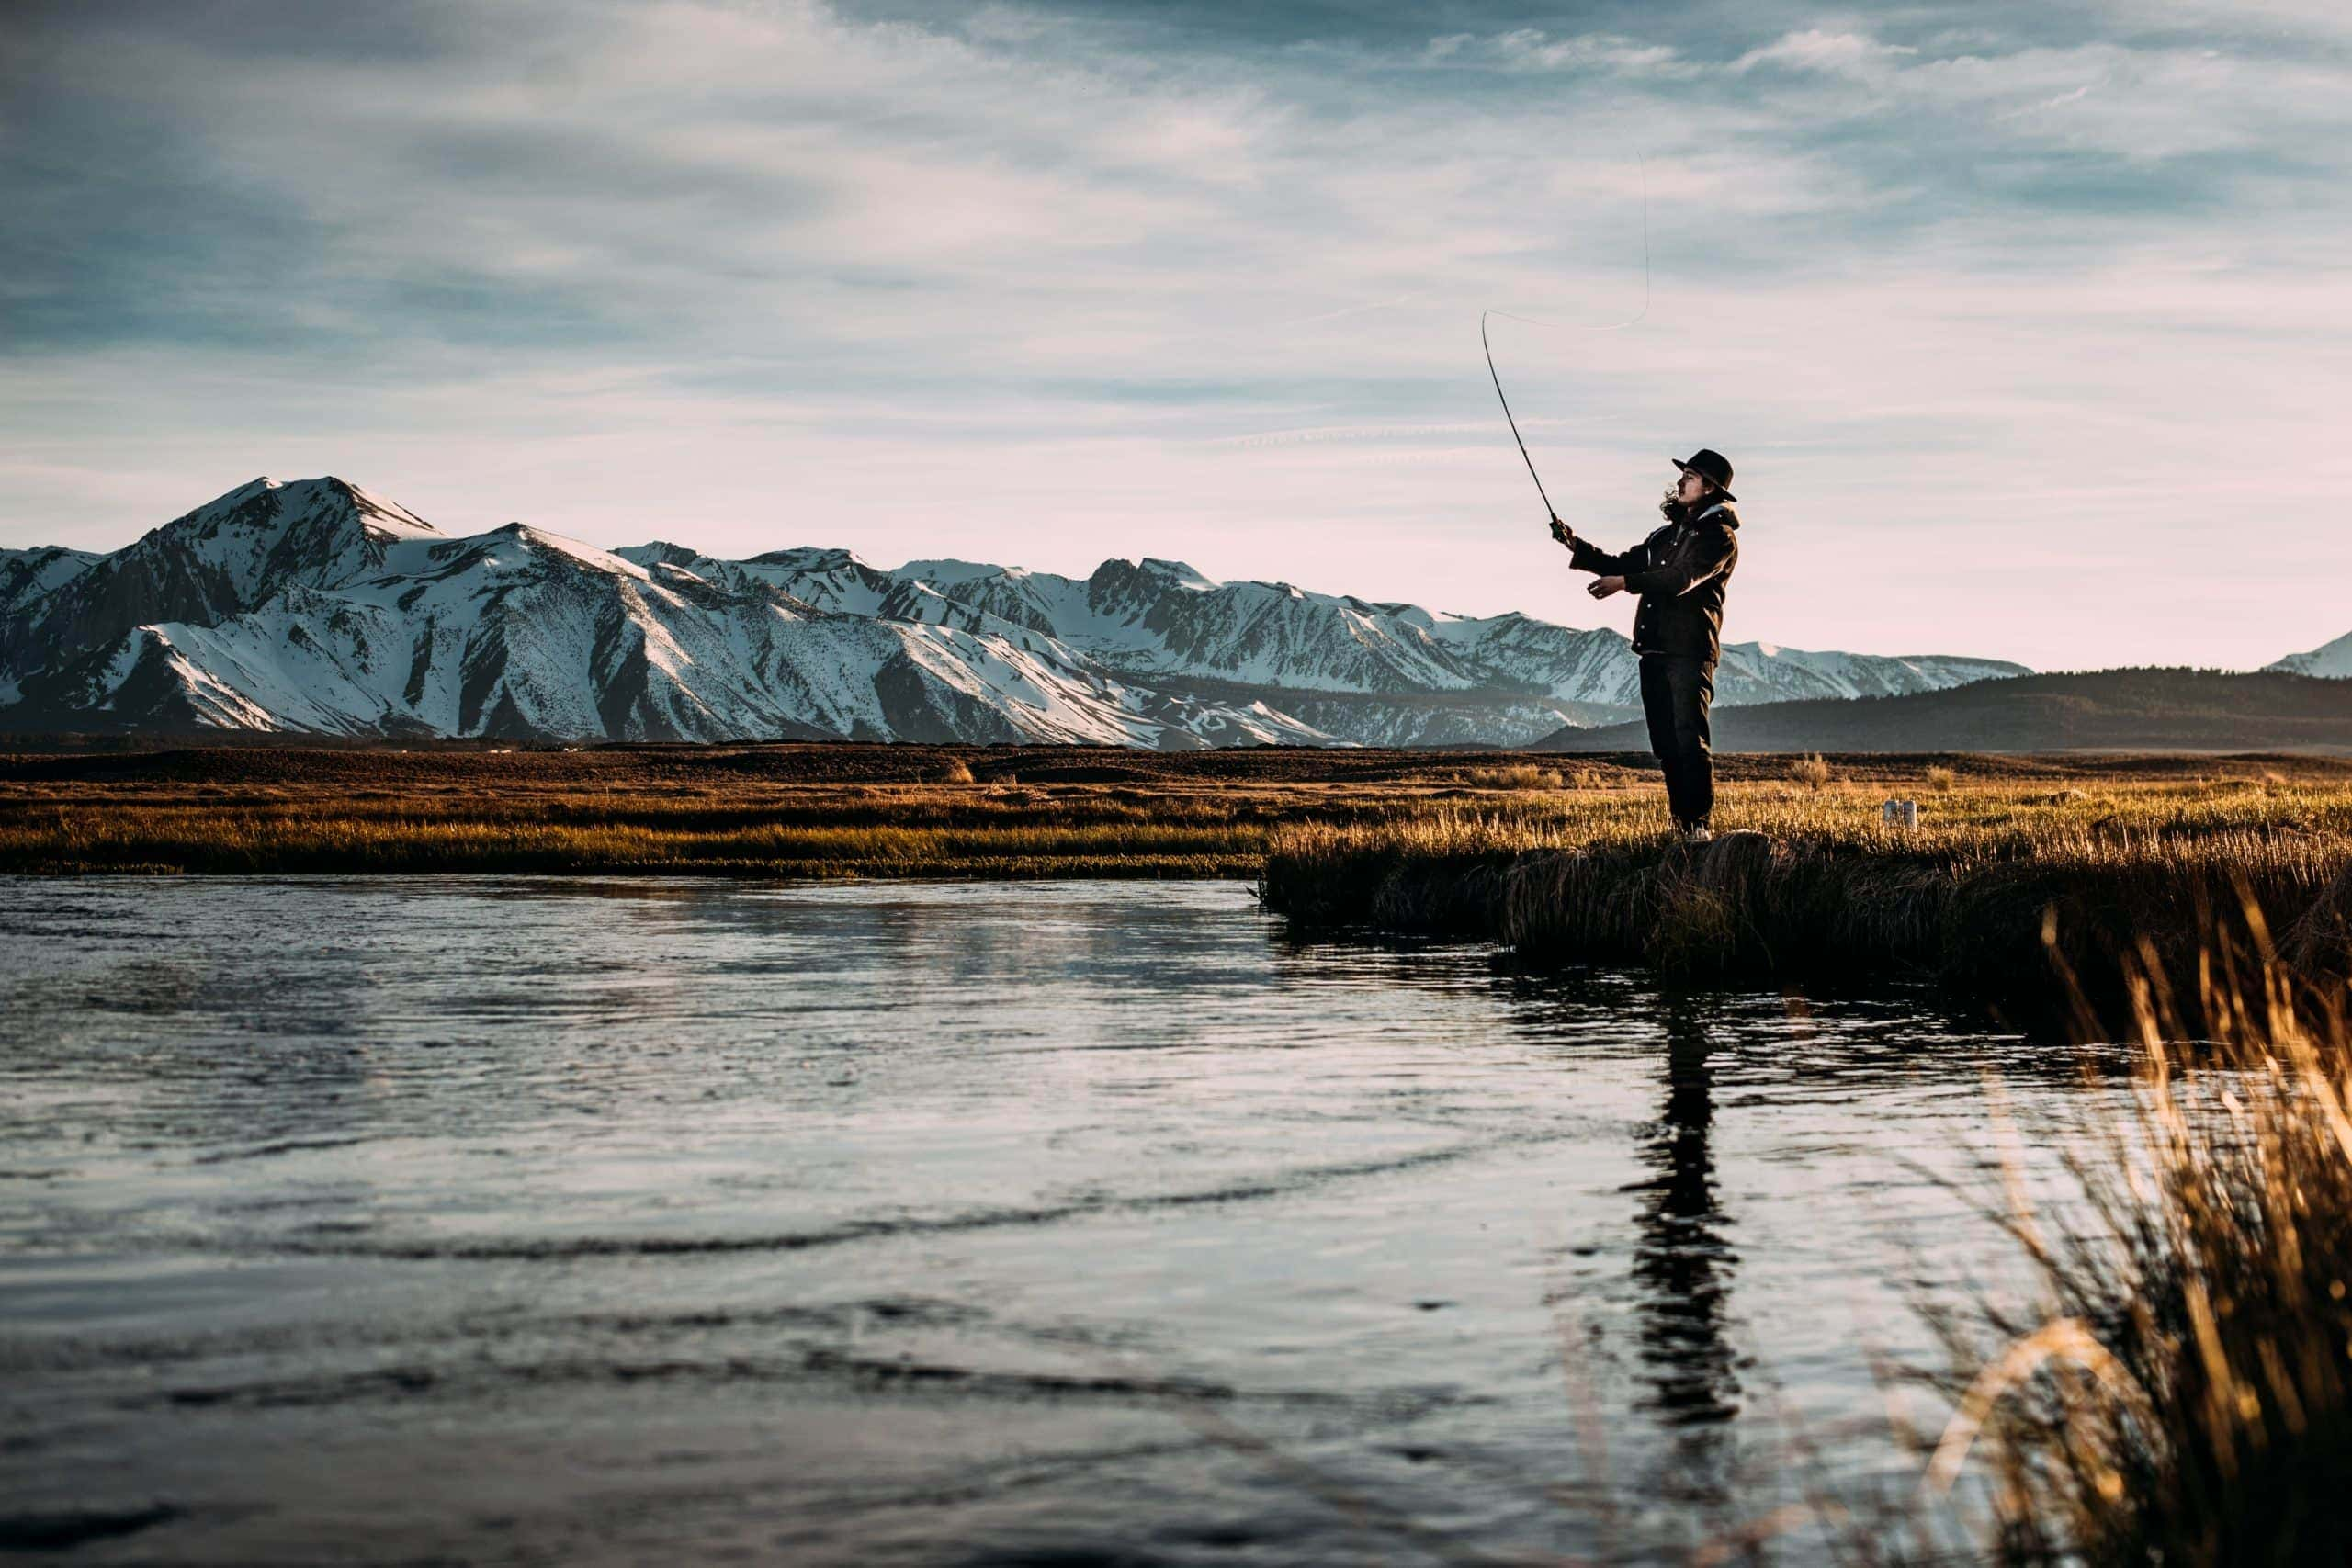 Fly Fishing Kayaks Zen And The Art Of Flying A Yak Yak Logic